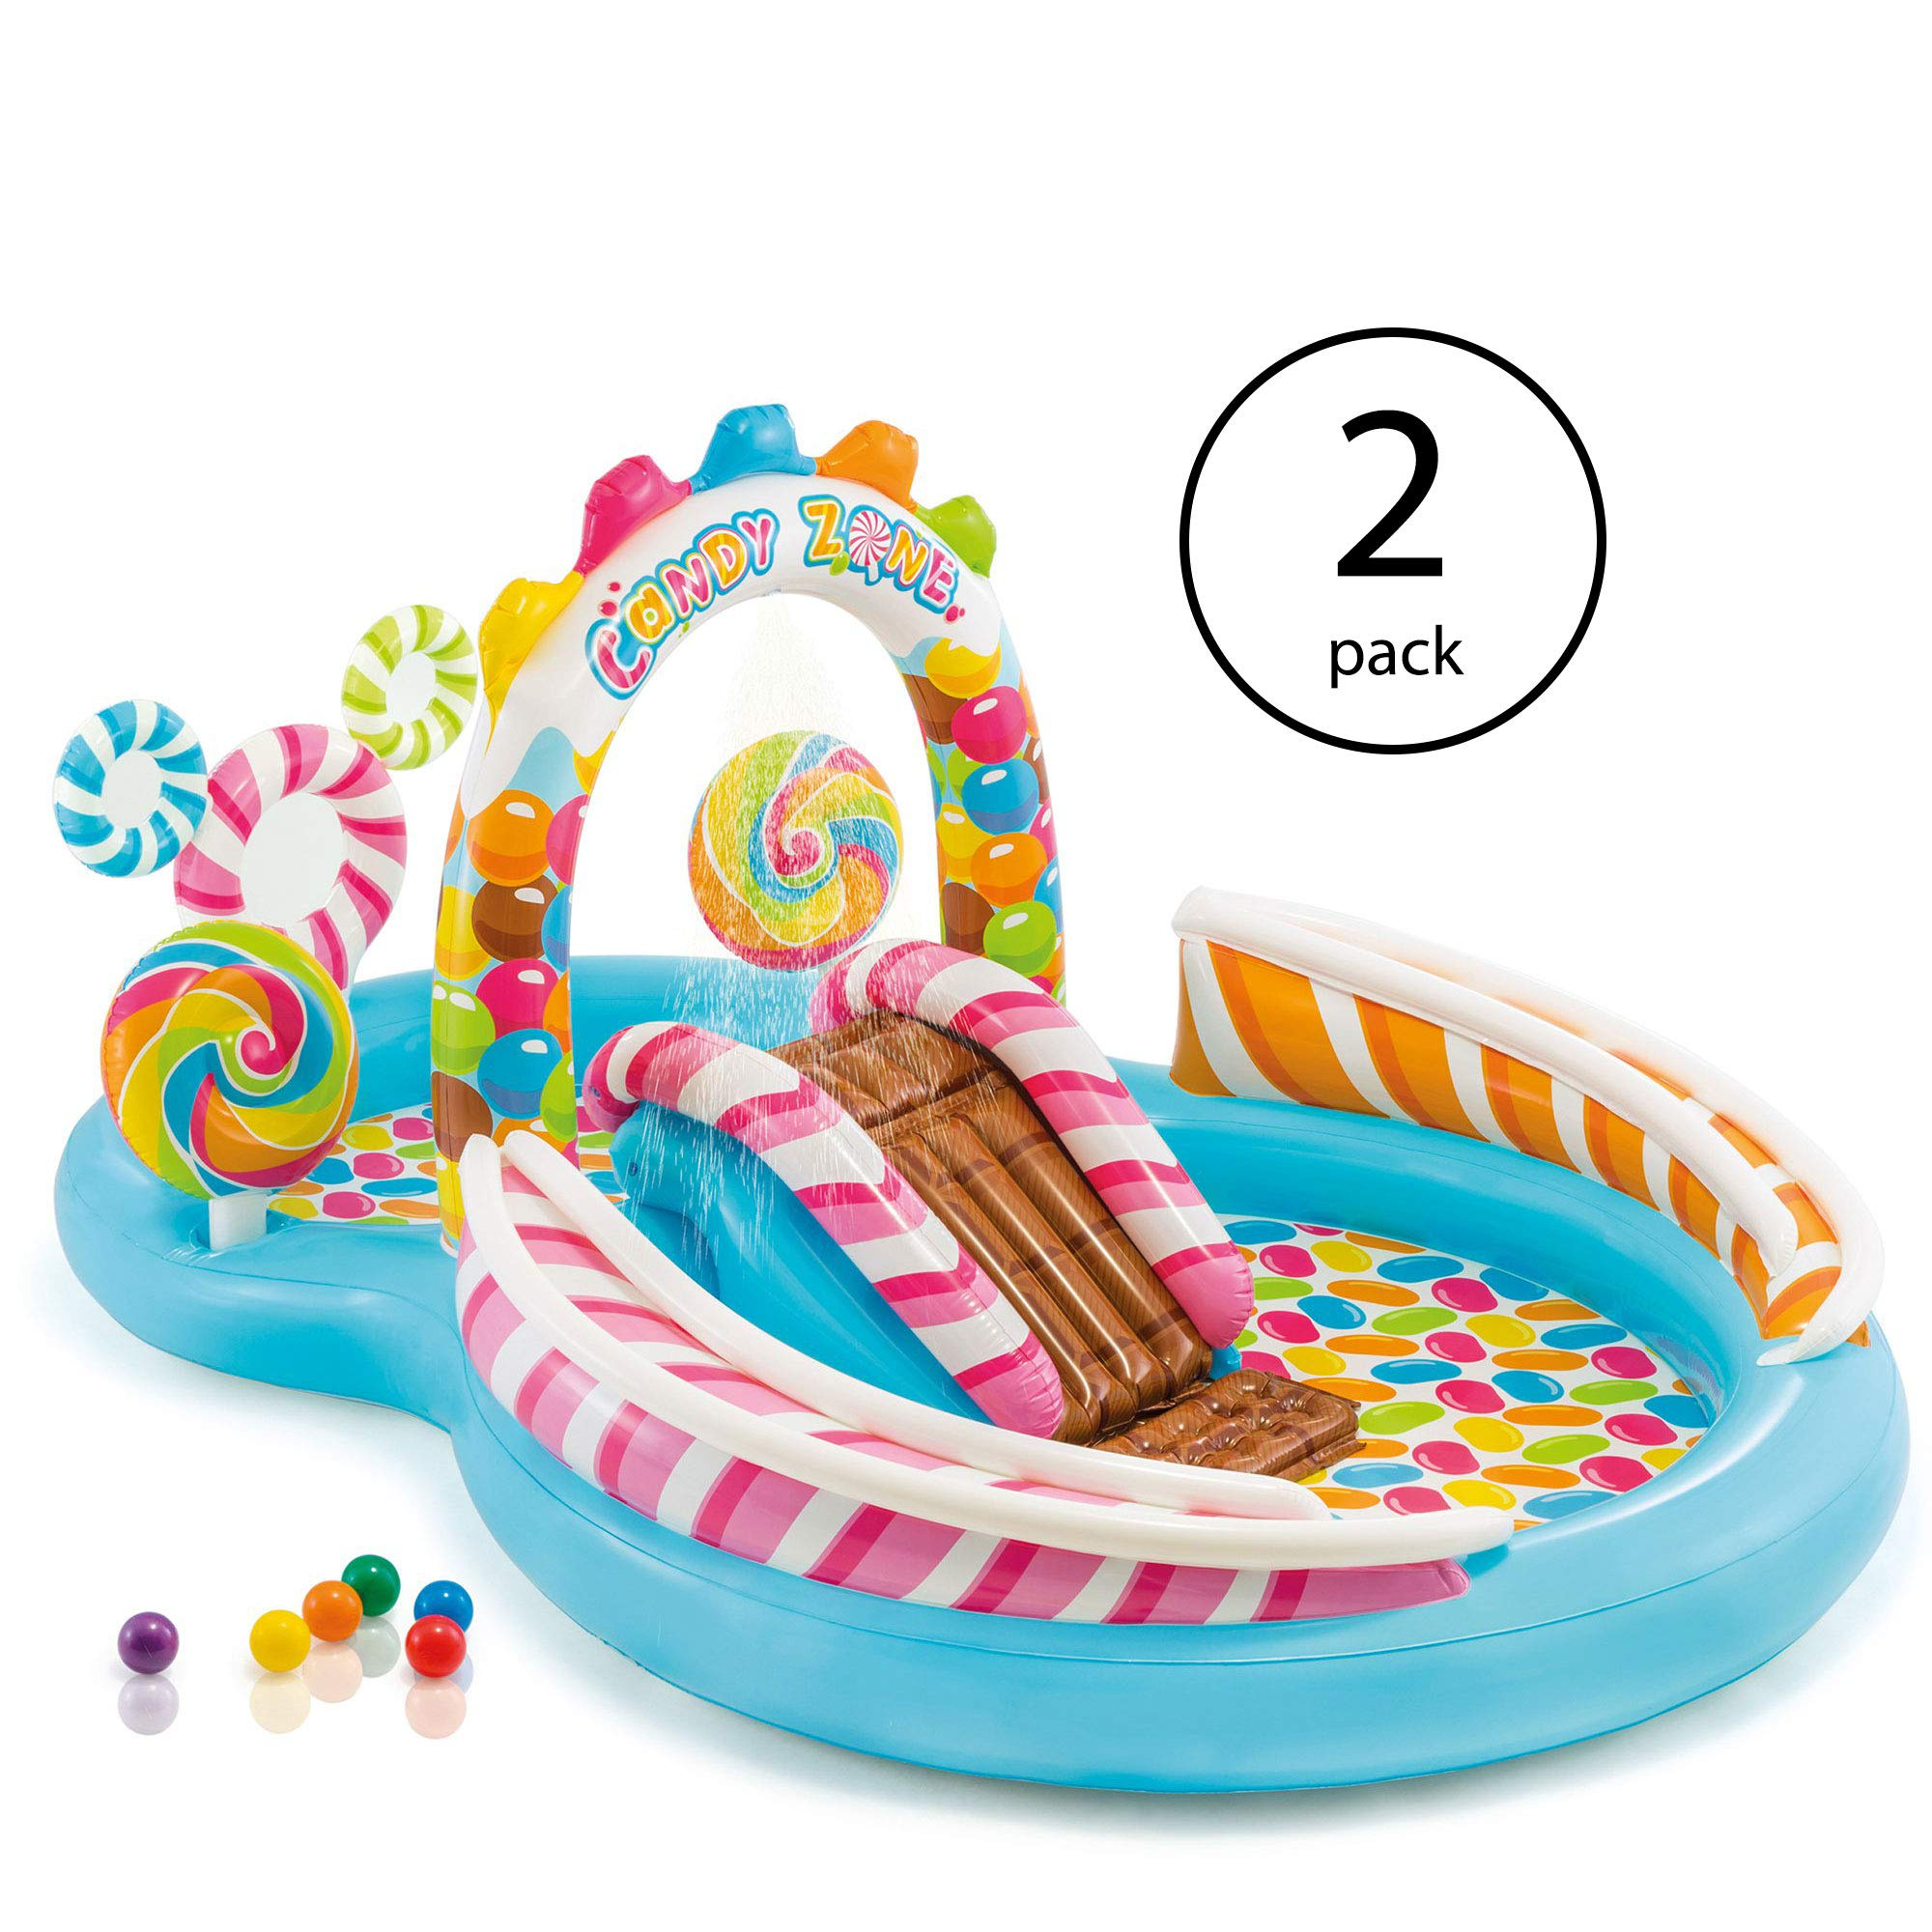 Intex Kids Inflatable Candy Zone Swim Play Center Kids Splash Pool w/ Waterslide (2 Pack)